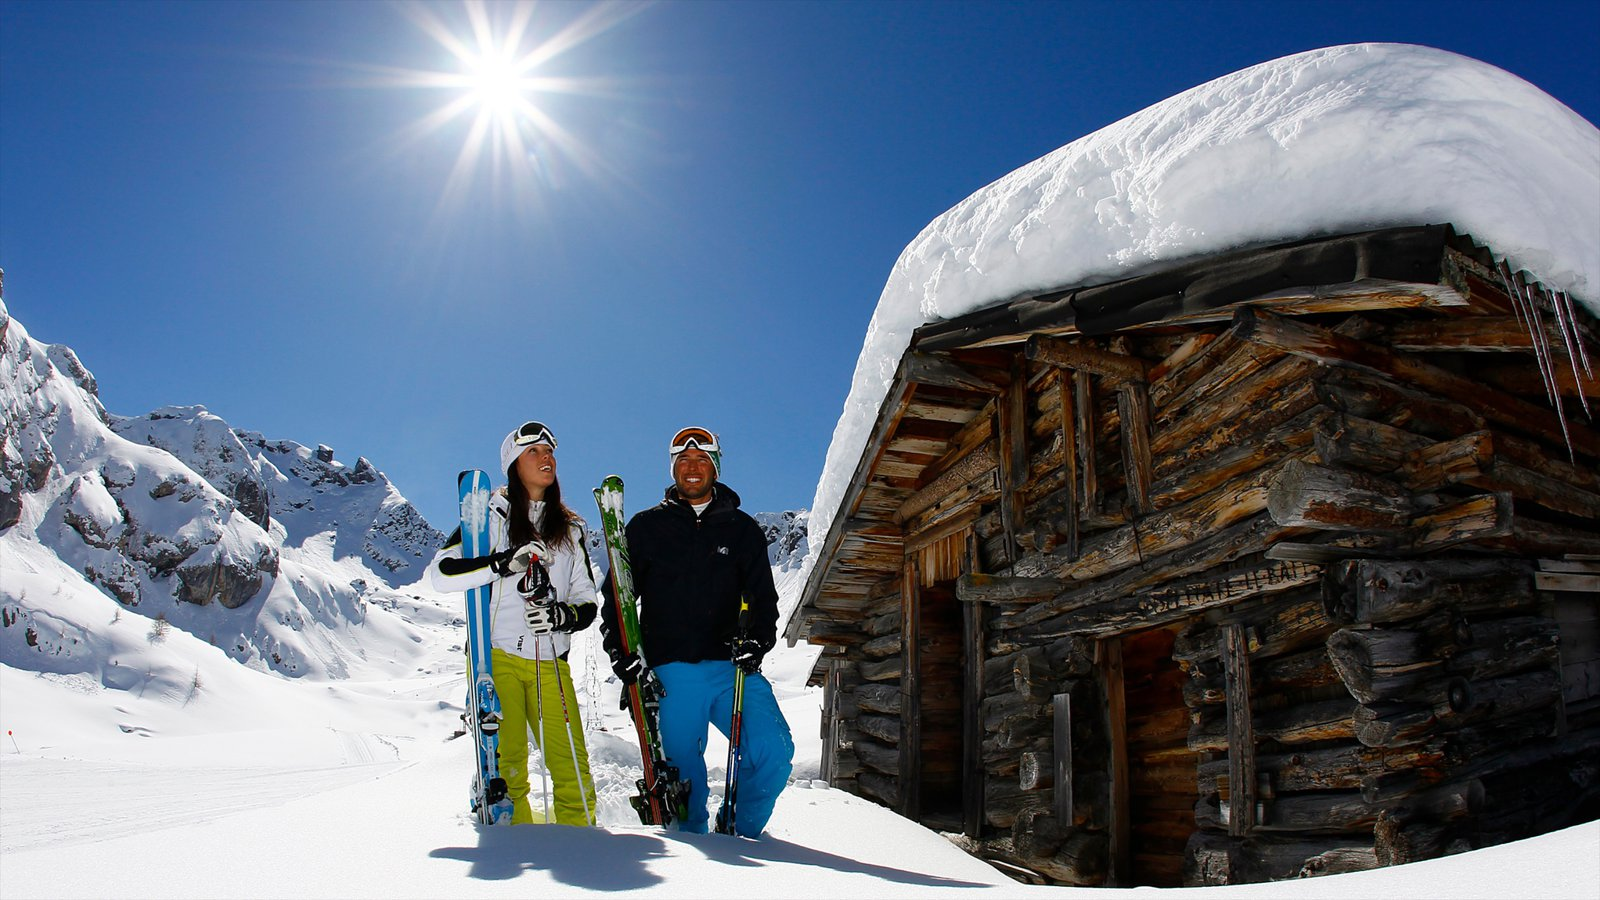 Fassa Valley caracterizando neve, uma casa e esqui na neve